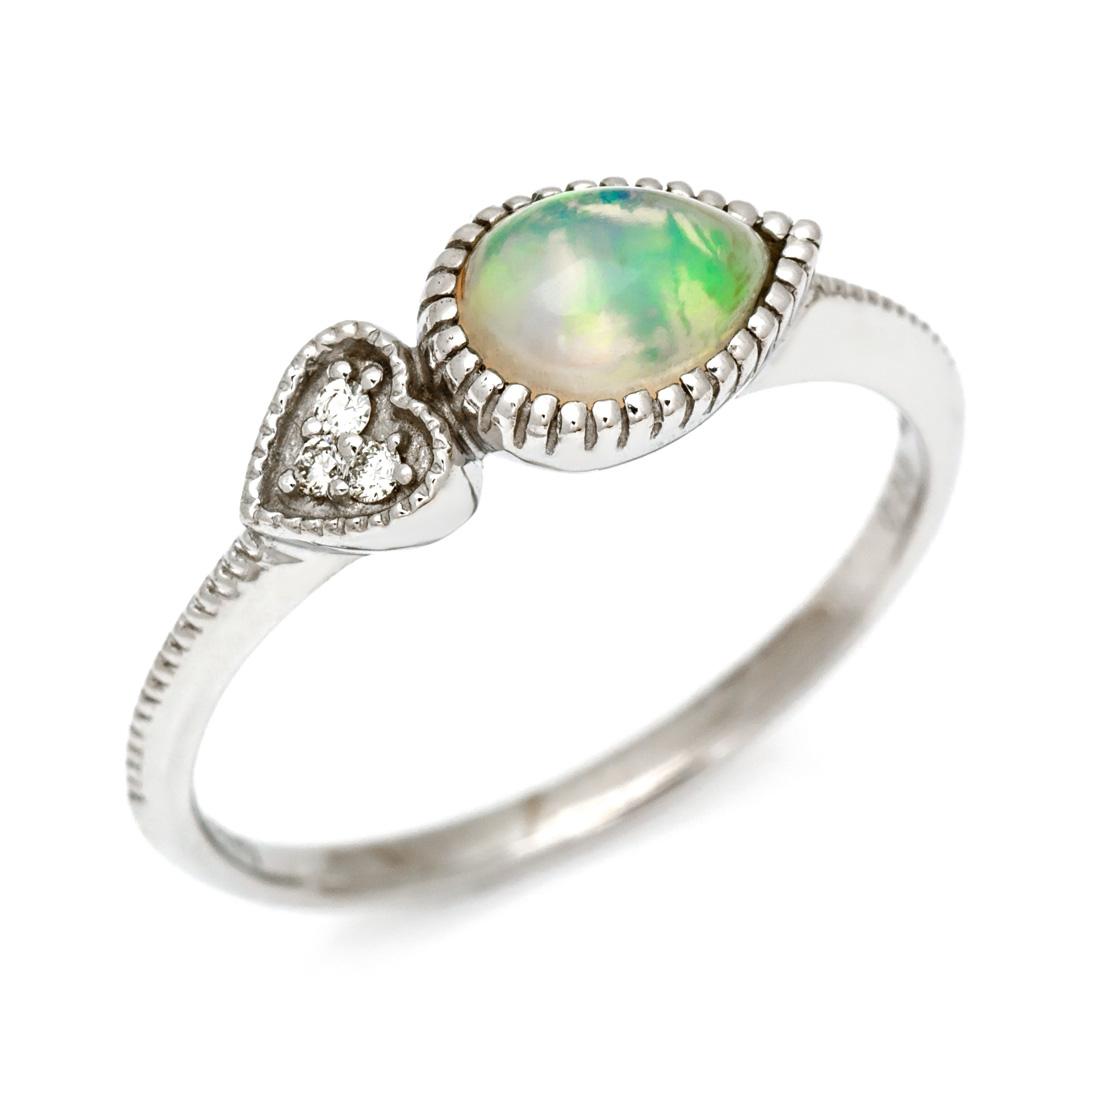 K18 オパール ダイヤモンド リング 「pianto」送料無料 指輪 18K 18金 ゴールド ホワイトオパール ライトオパール ダイアモンド 誕生日 10月誕生石 文字入れ 刻印 ピンキーリング対応可能 メッセージ ギフト 贈り物